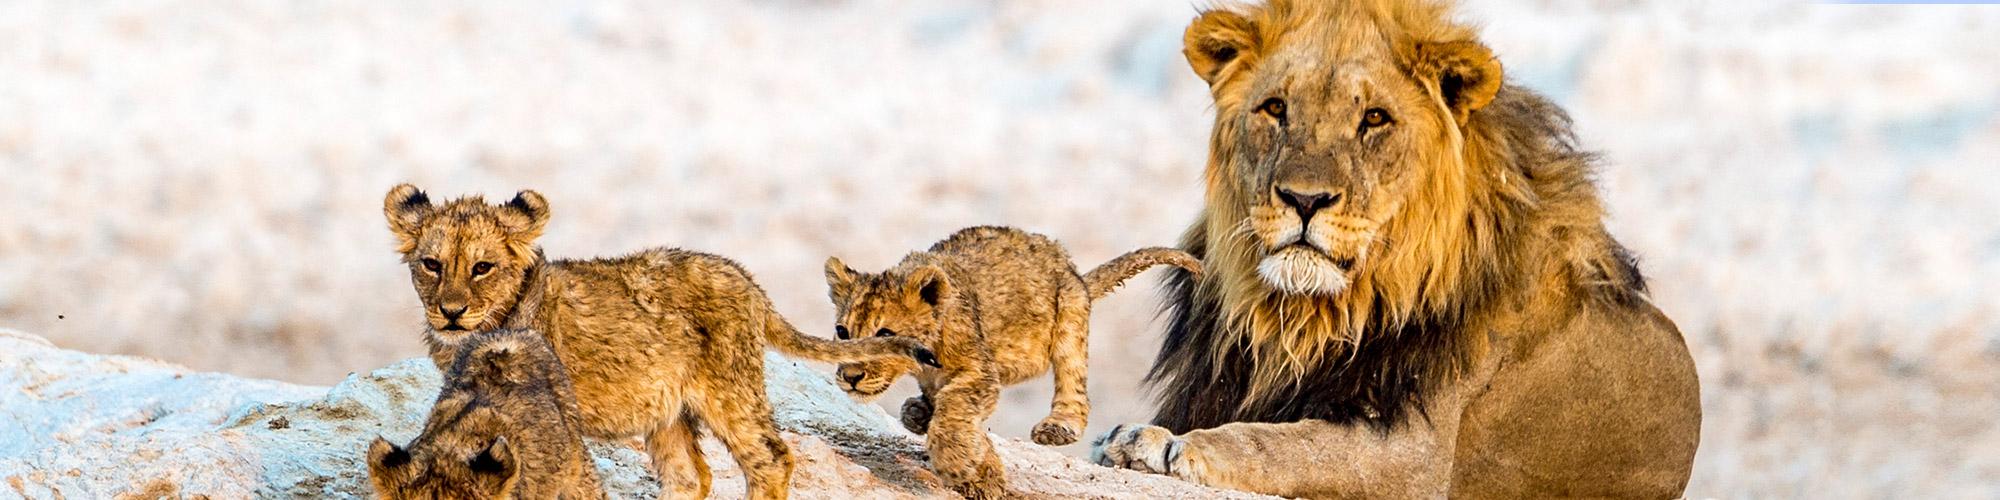 Aventura en Namibia - EL PAIS Viajes